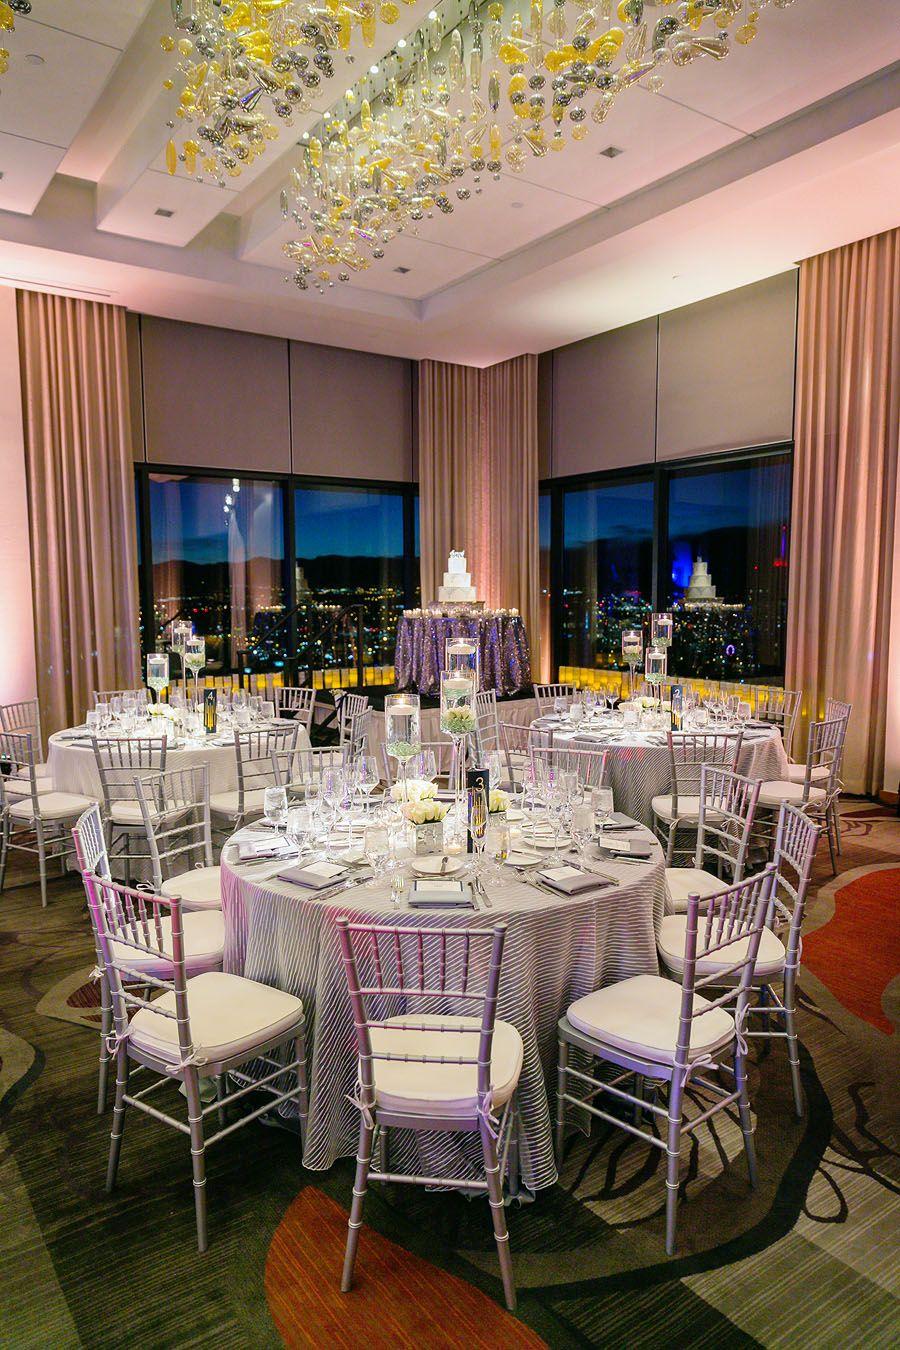 Grand Hyatt Denver Pinnacle Club